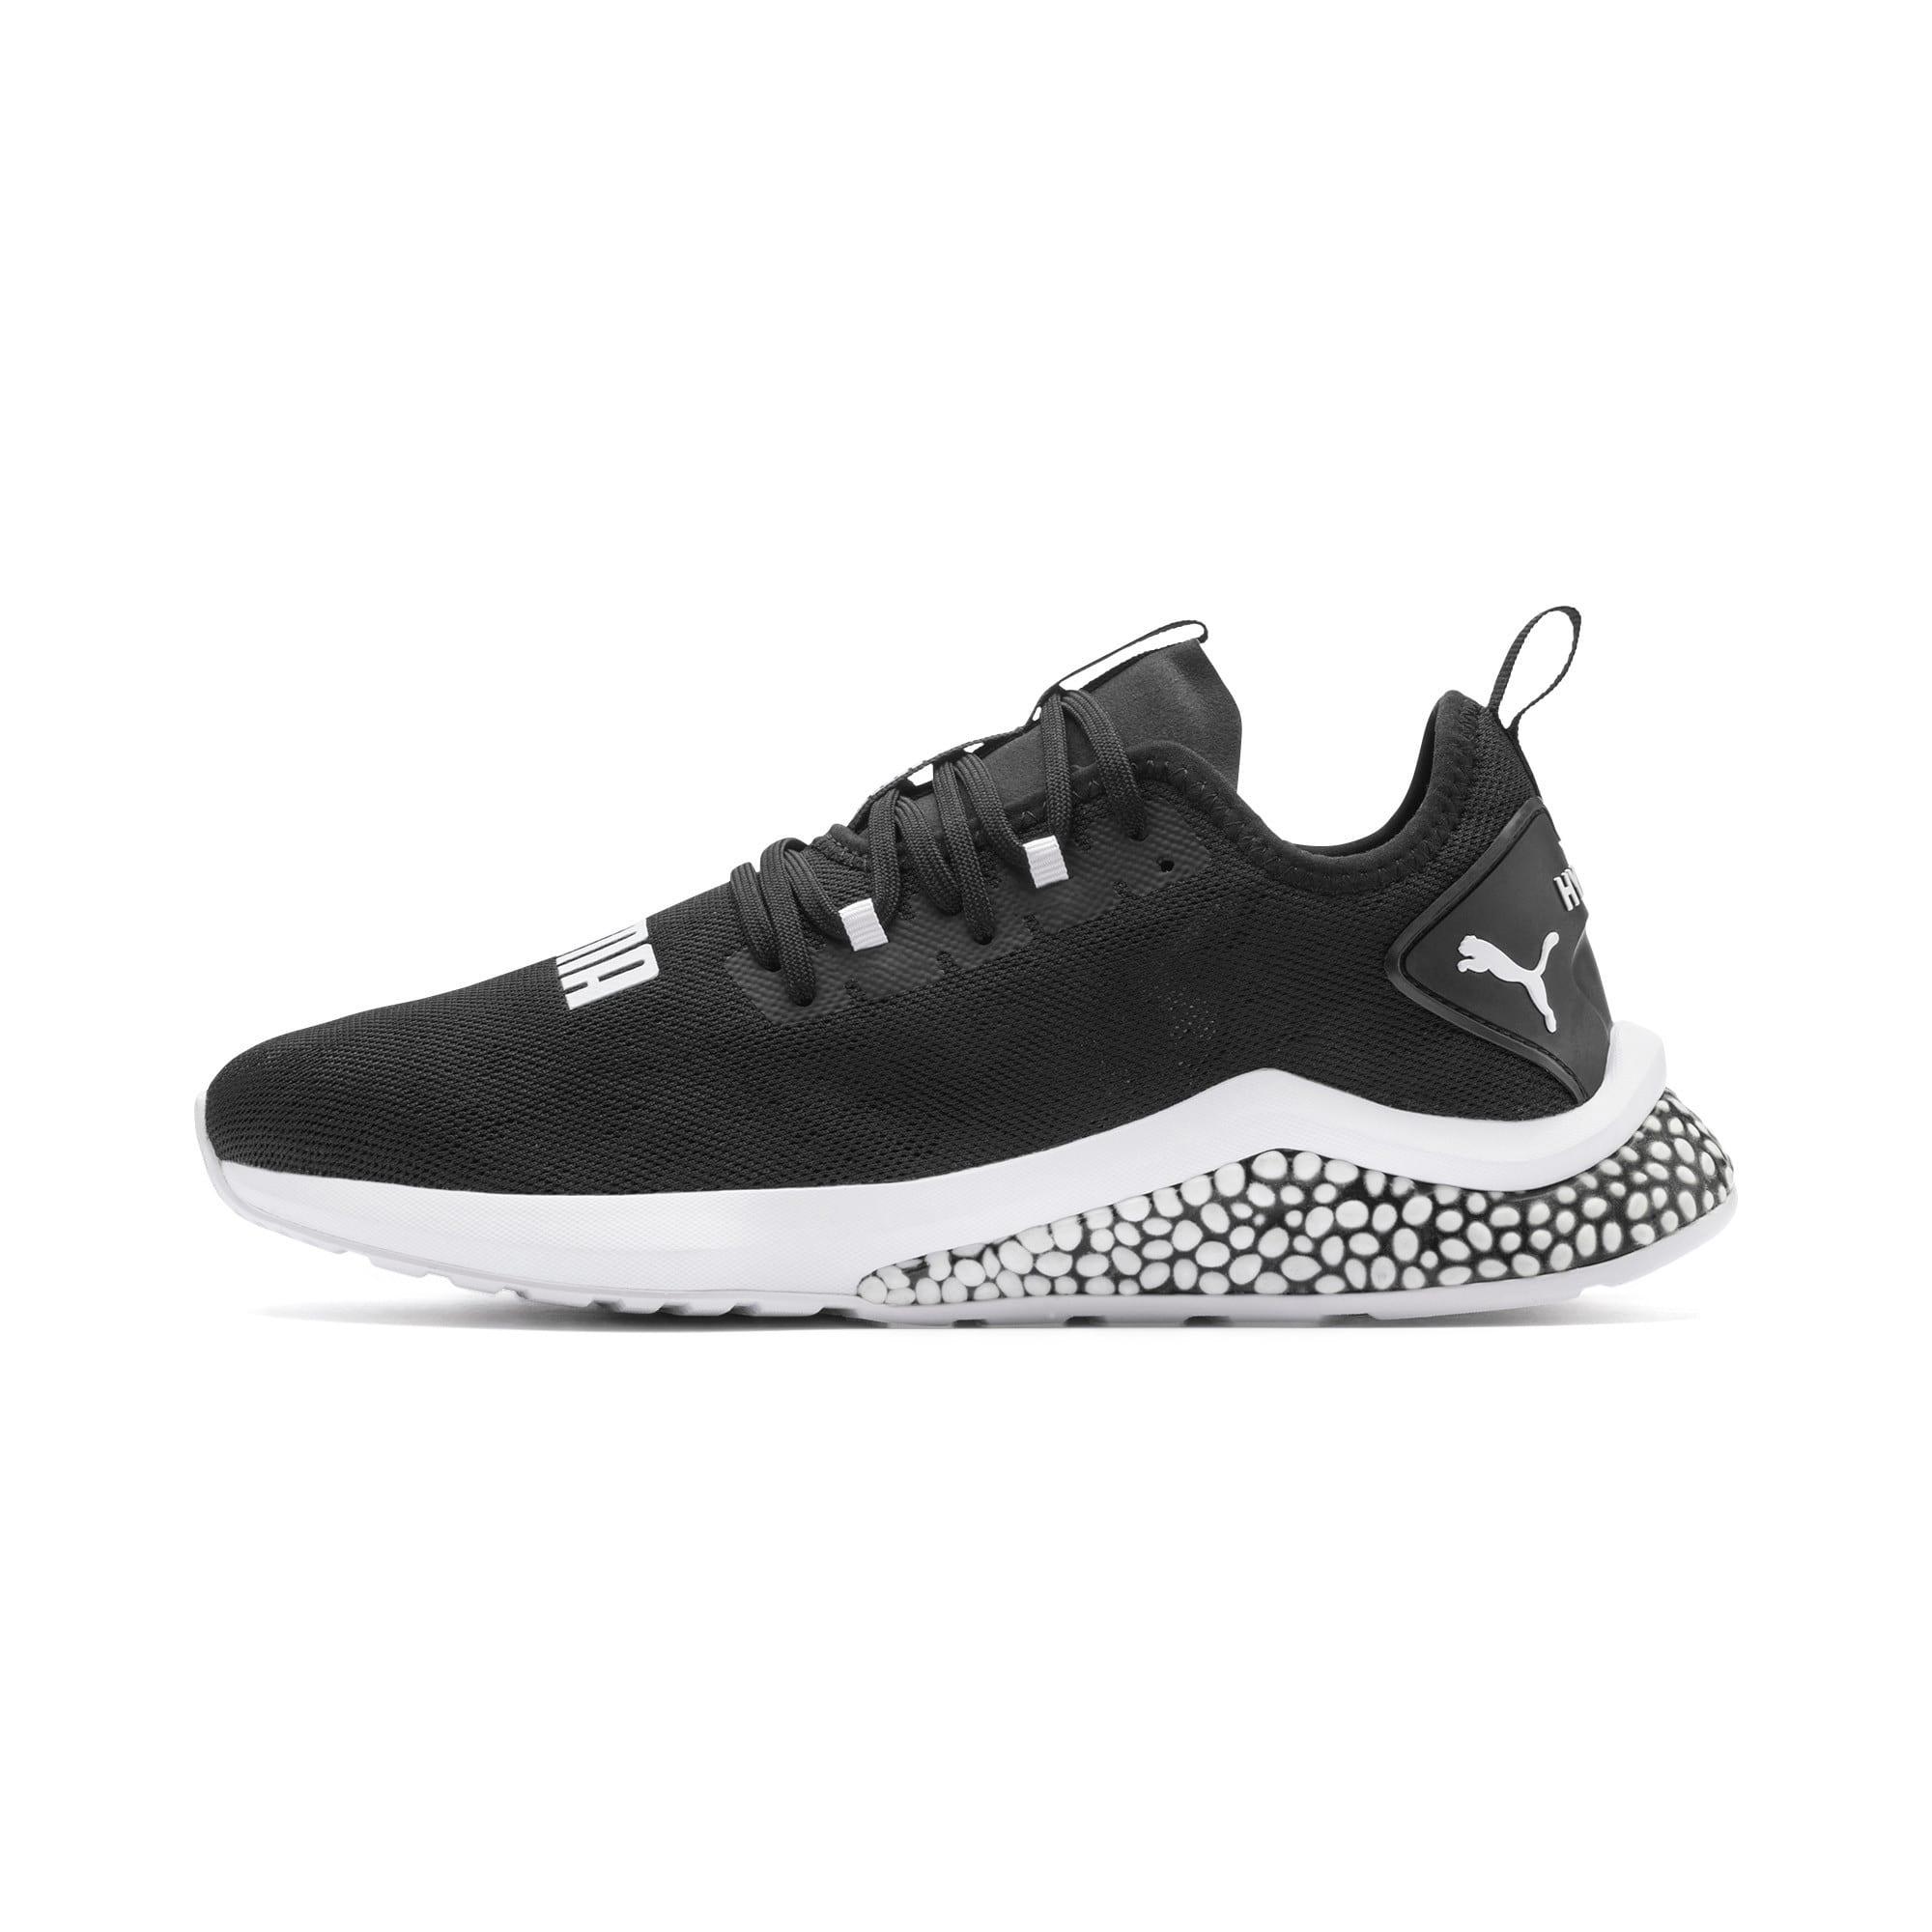 Thumbnail 1 of HYBRID NX Camo Men's Running Shoes, Puma Black-Puma White, medium